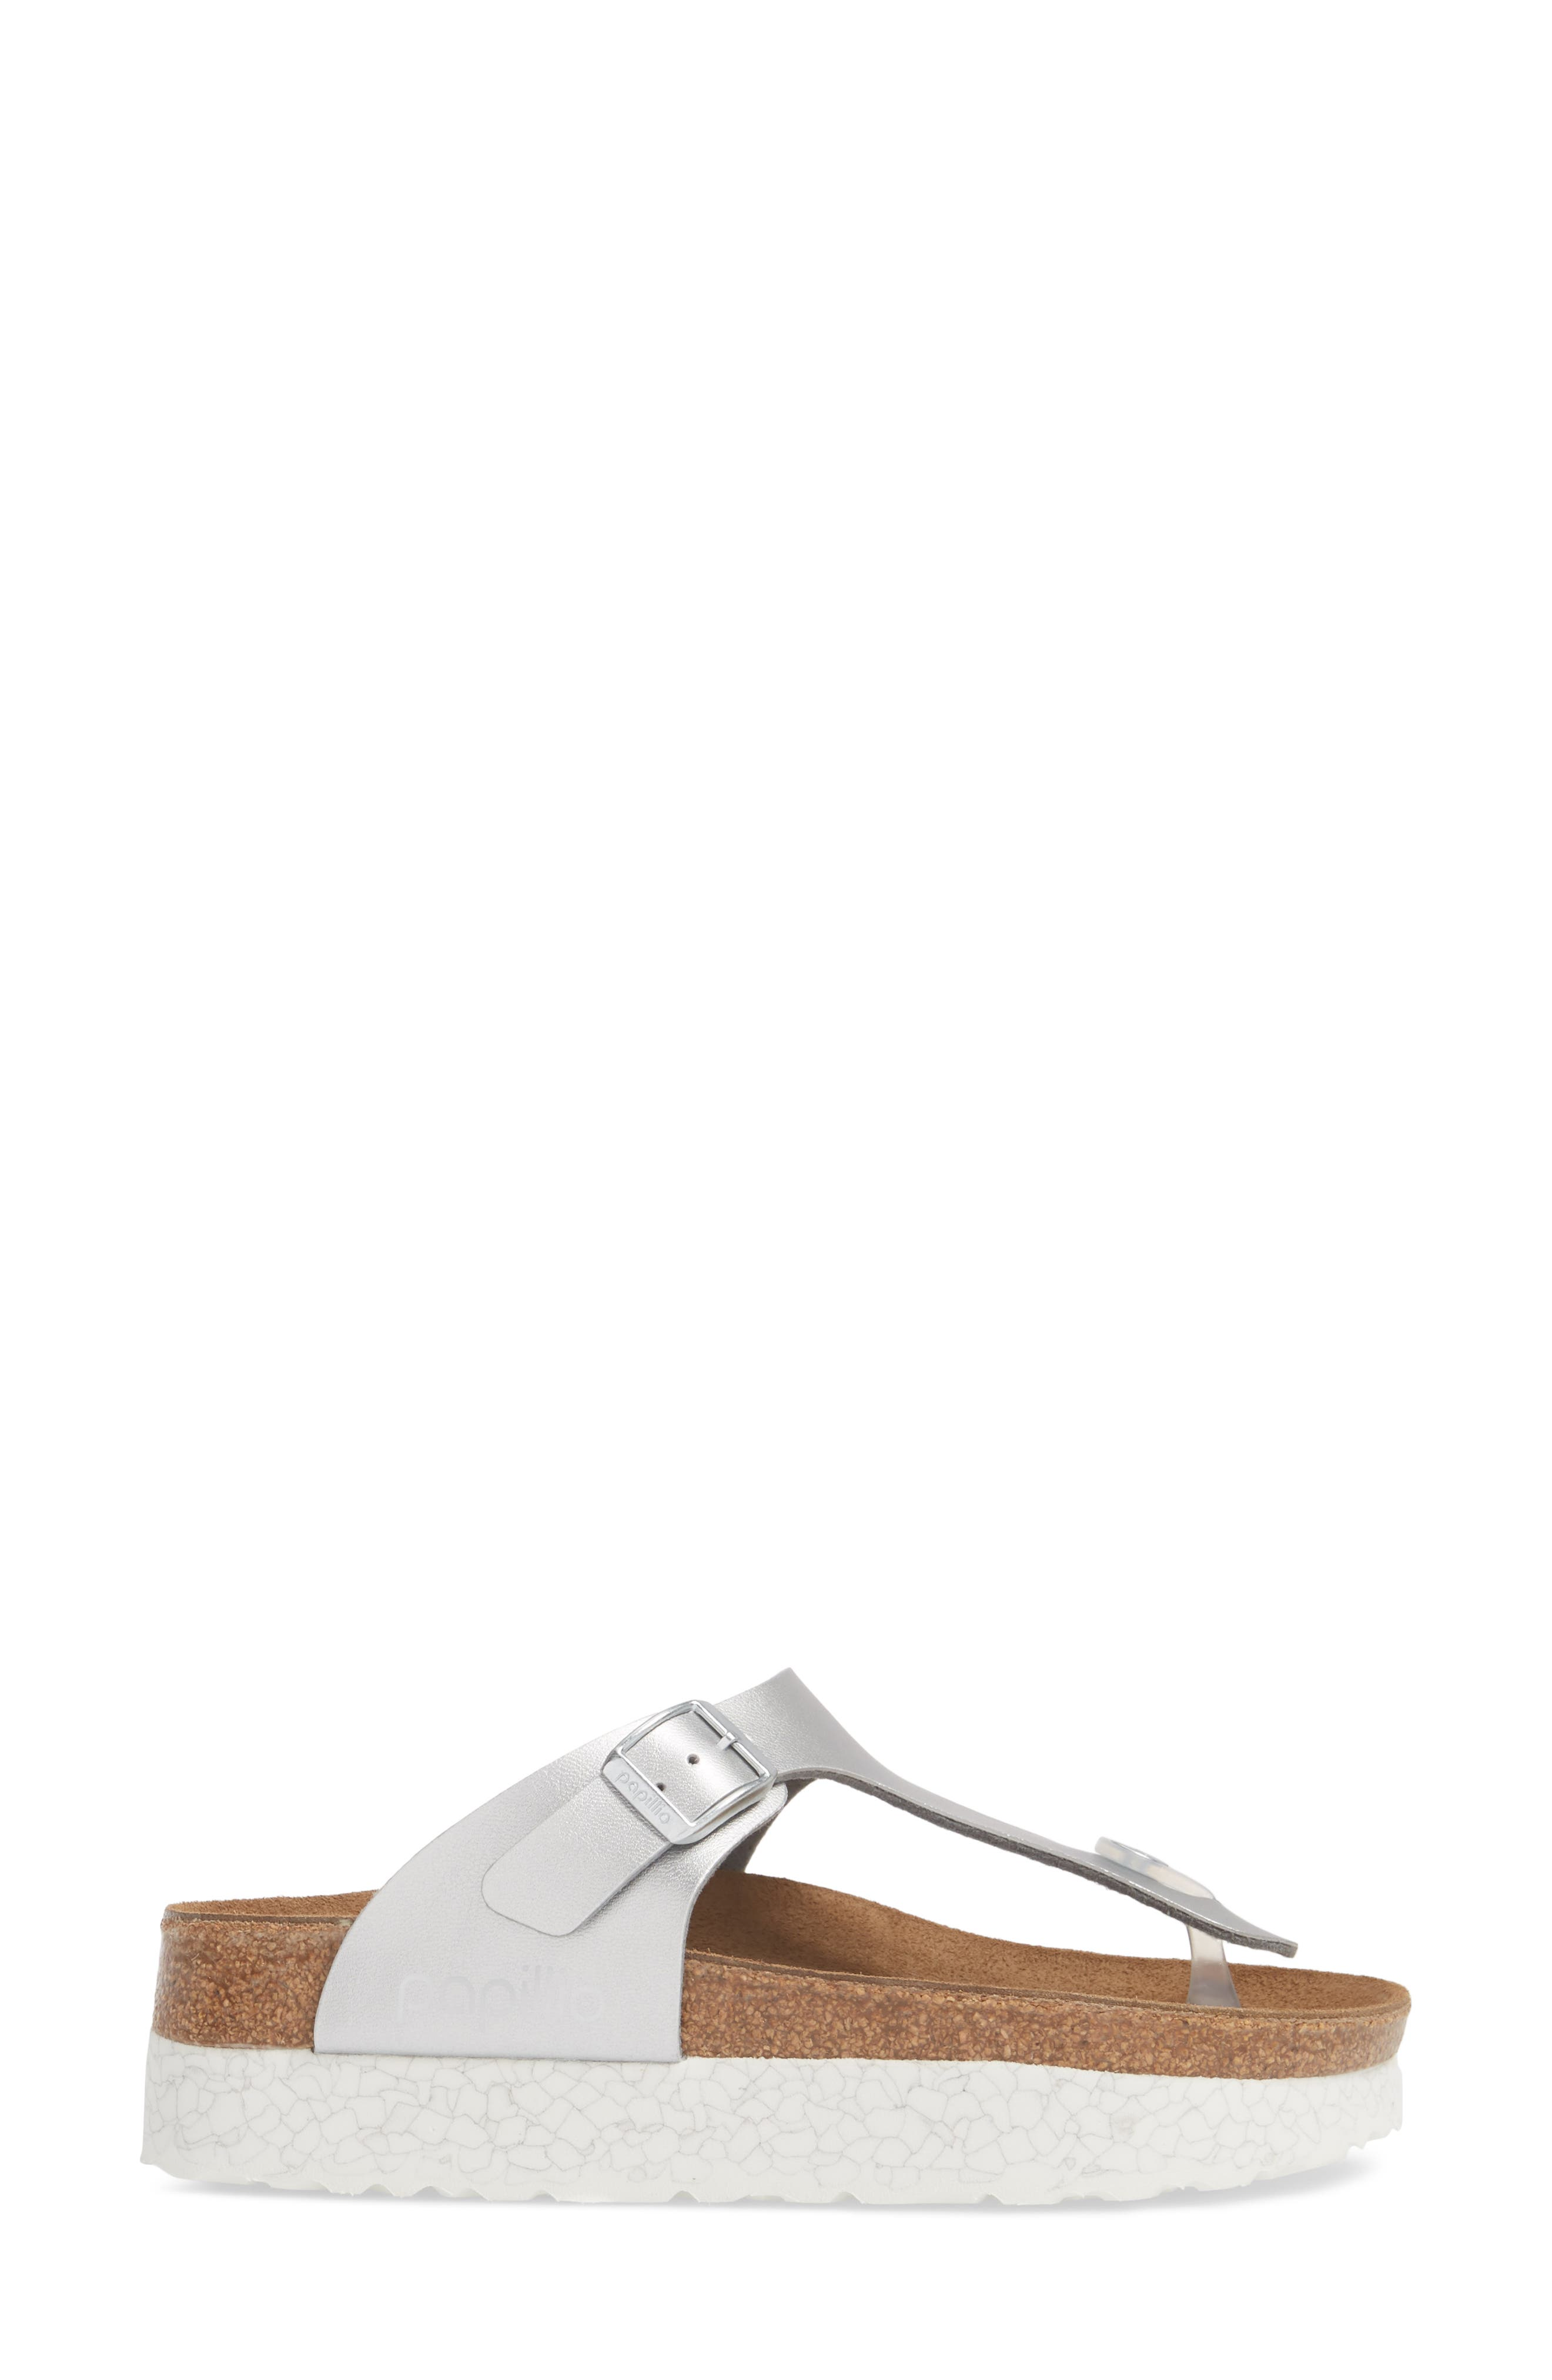 Papillio by Birkenstock 'Gizeh' Birko-Flor Platform Flip Flop Sandal,                             Alternate thumbnail 3, color,                             Mono Marble Silver Leather